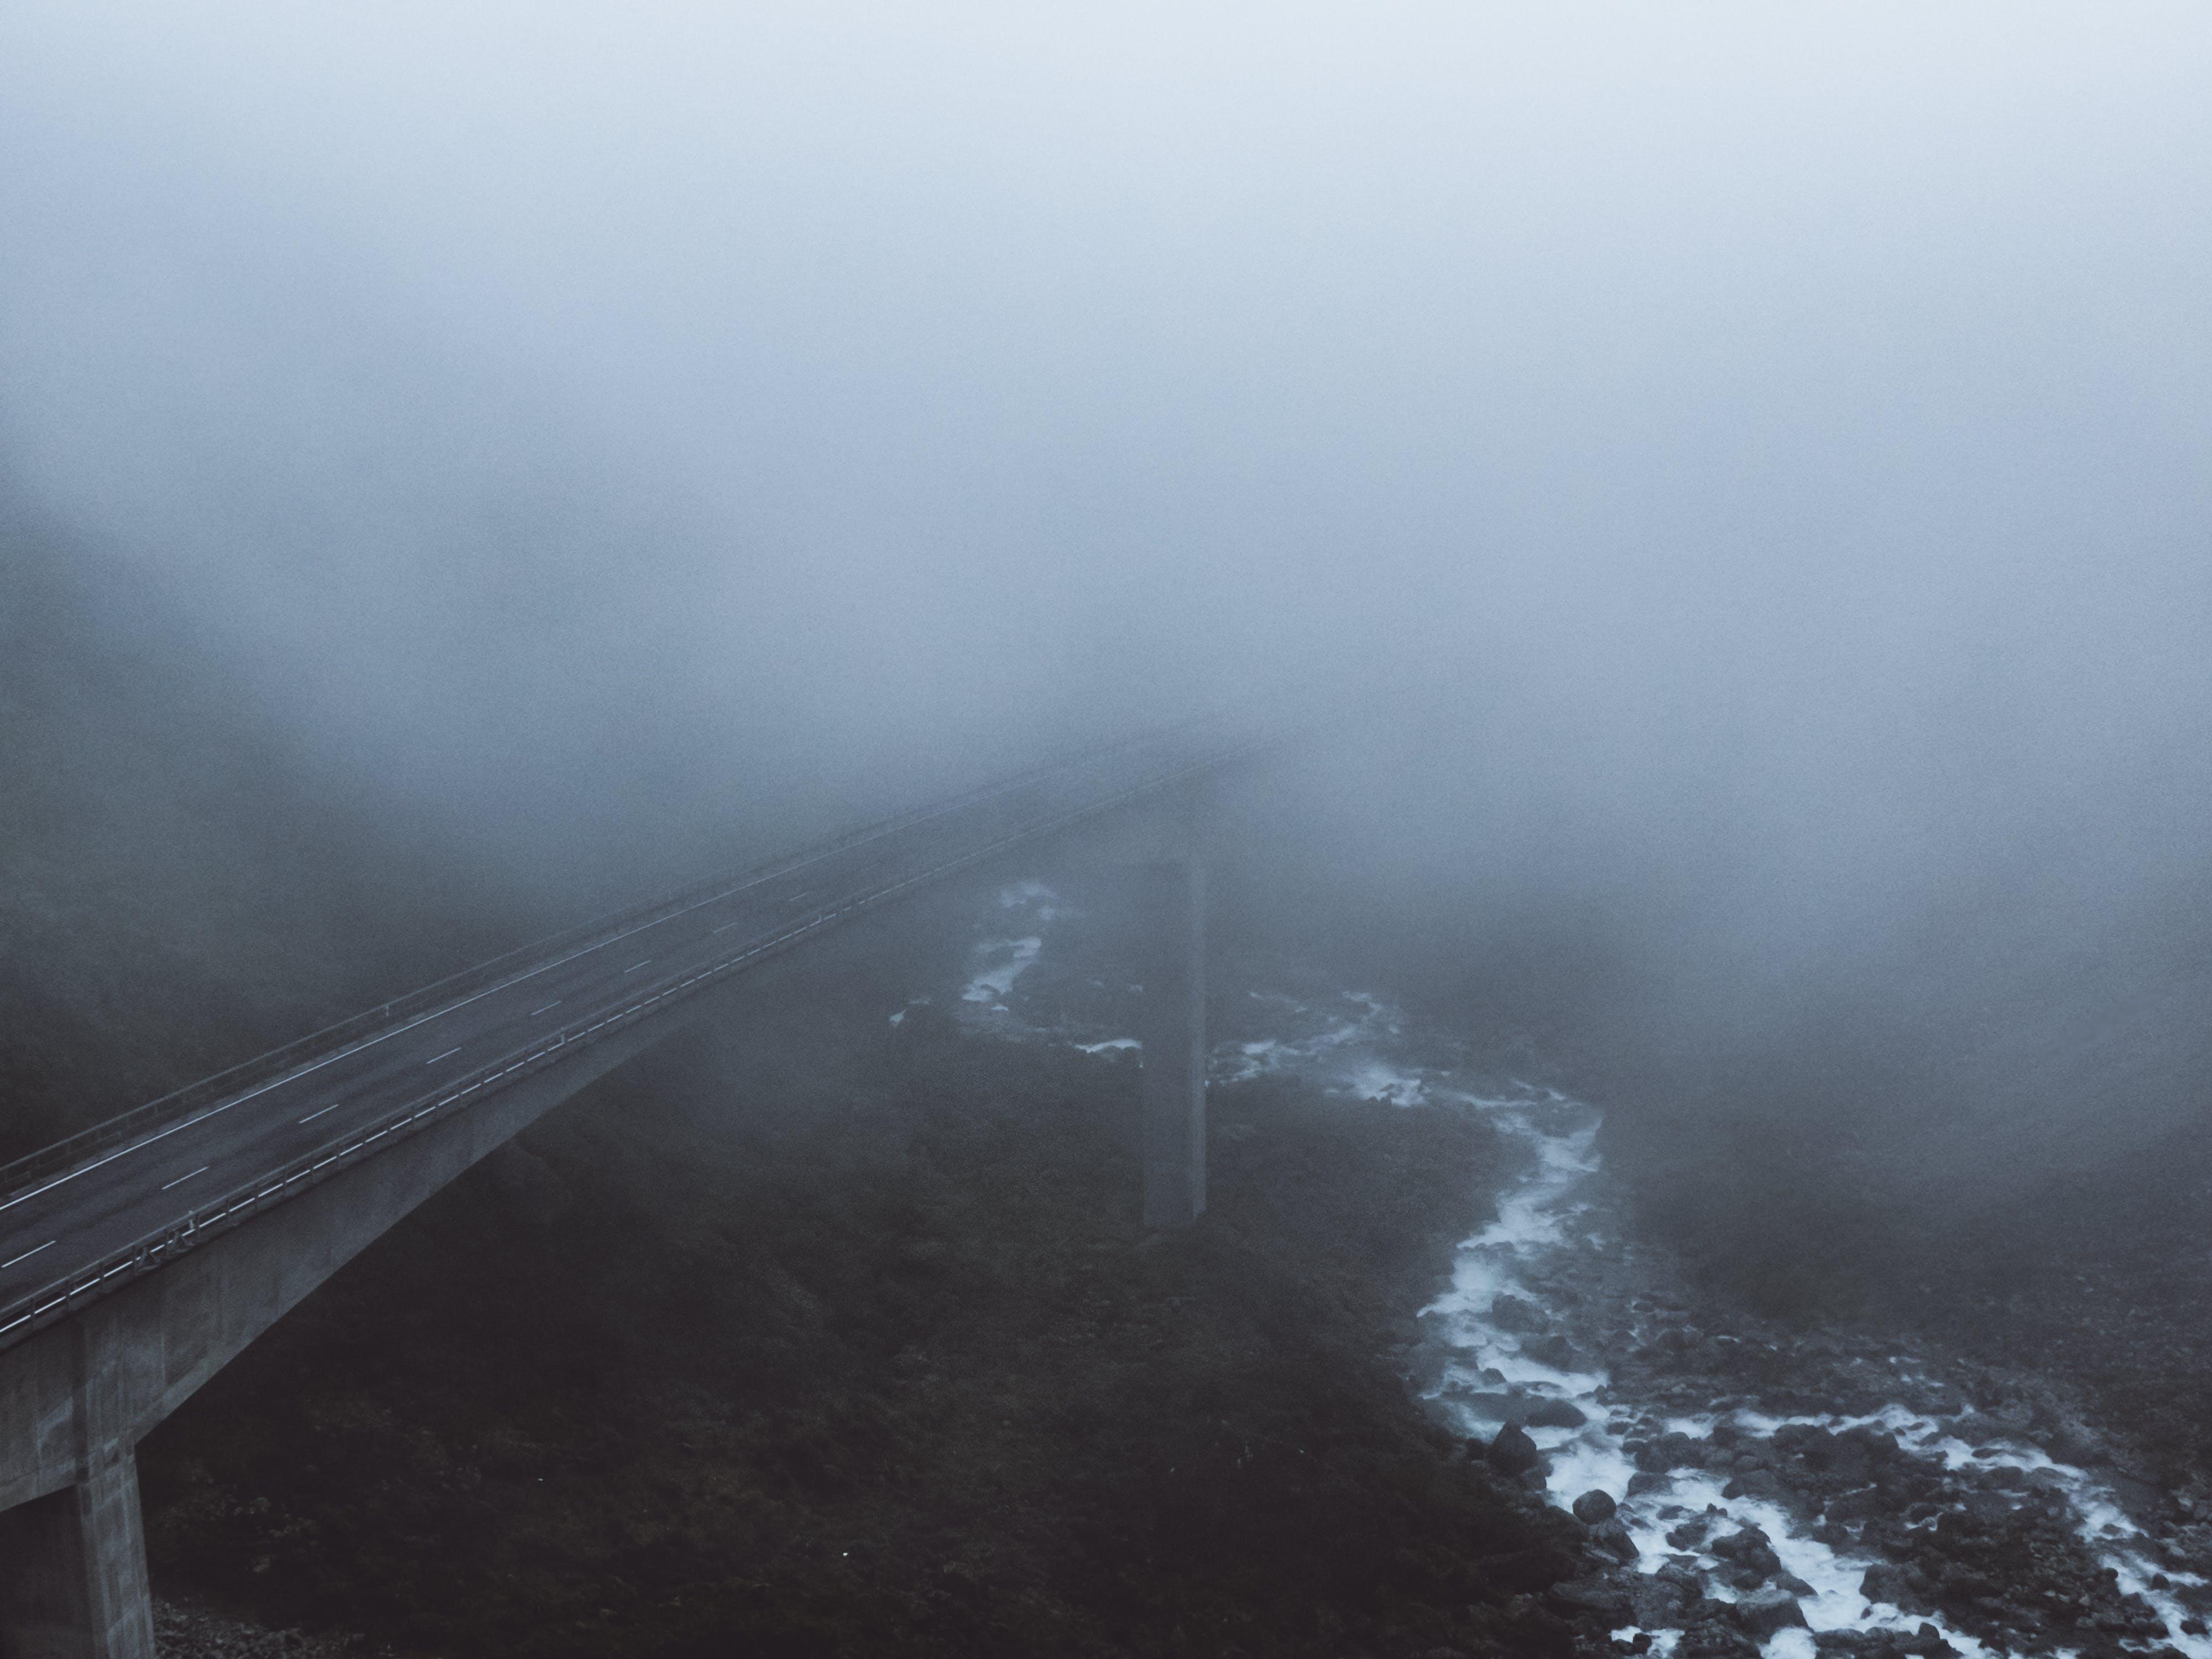 Concrete Bridge Covered With Mist